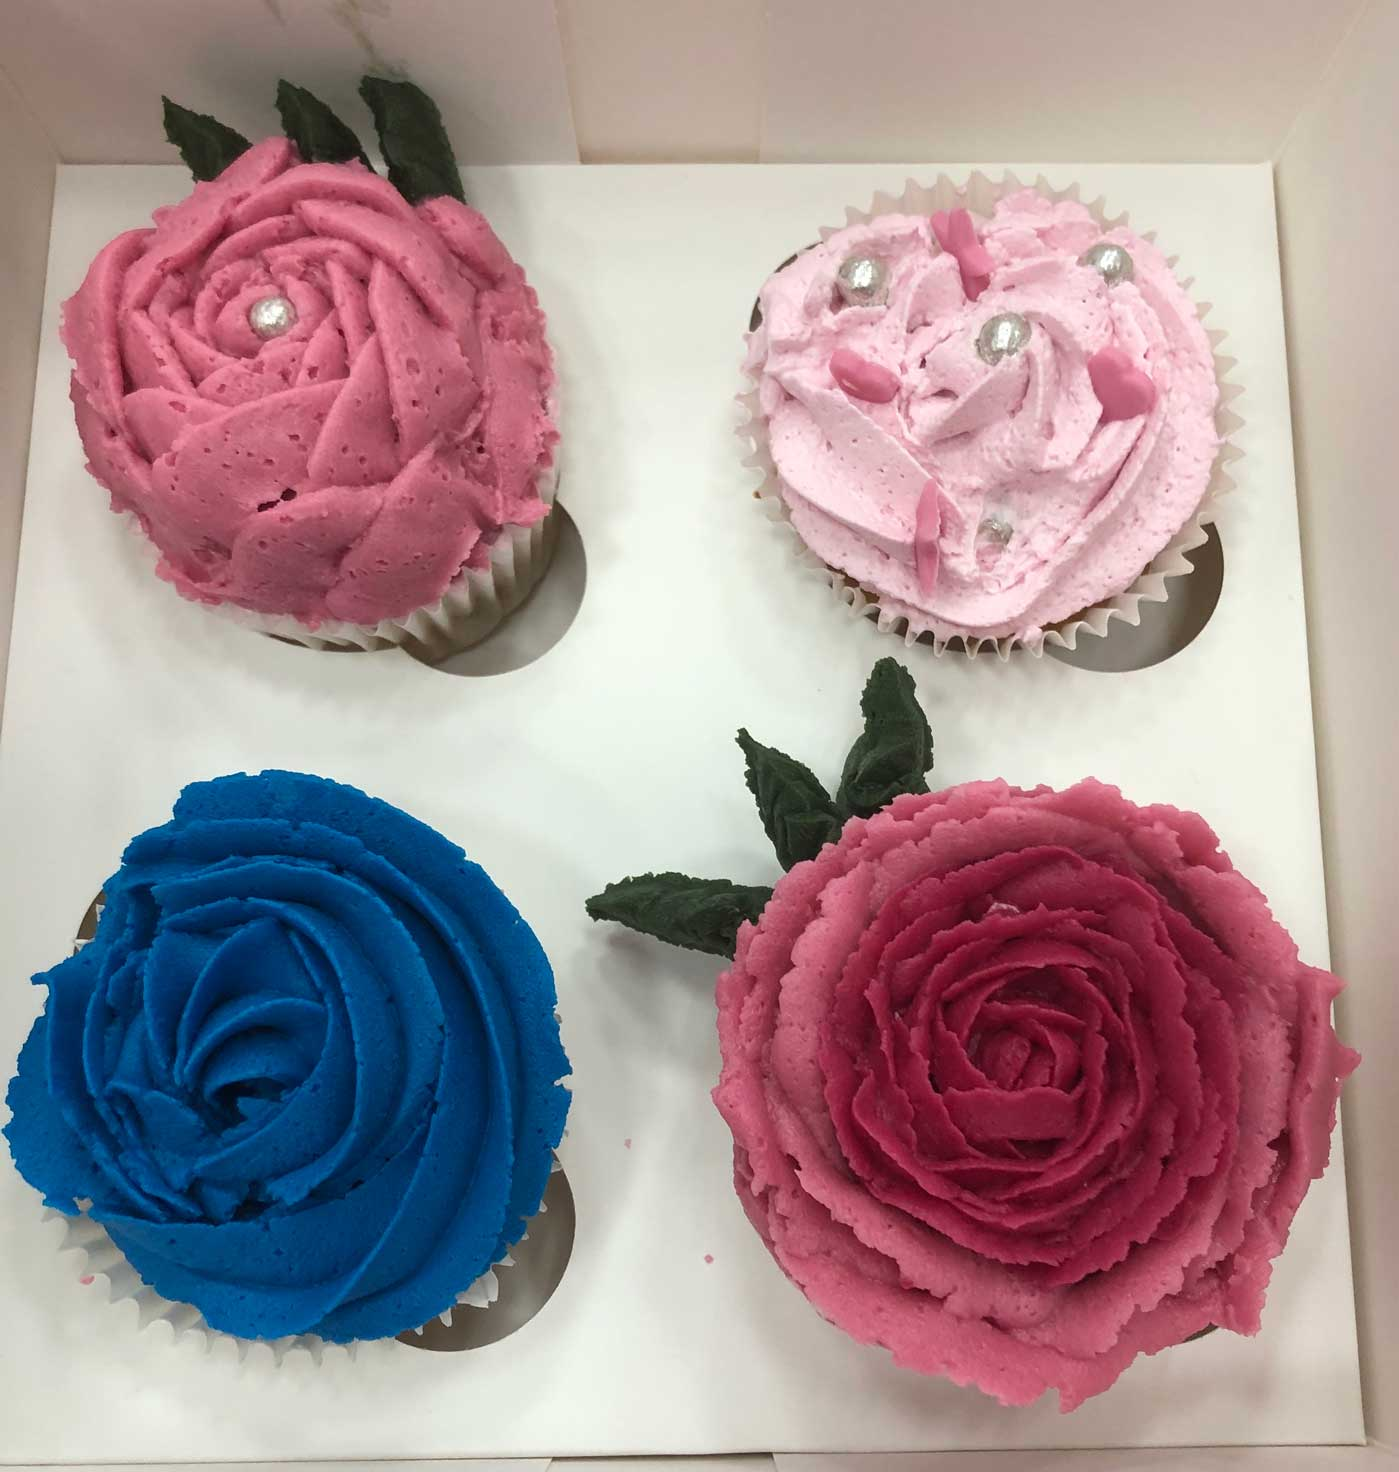 mamacake_reposteria_creativa_sevilla_curso_cupcakes_buttercream3